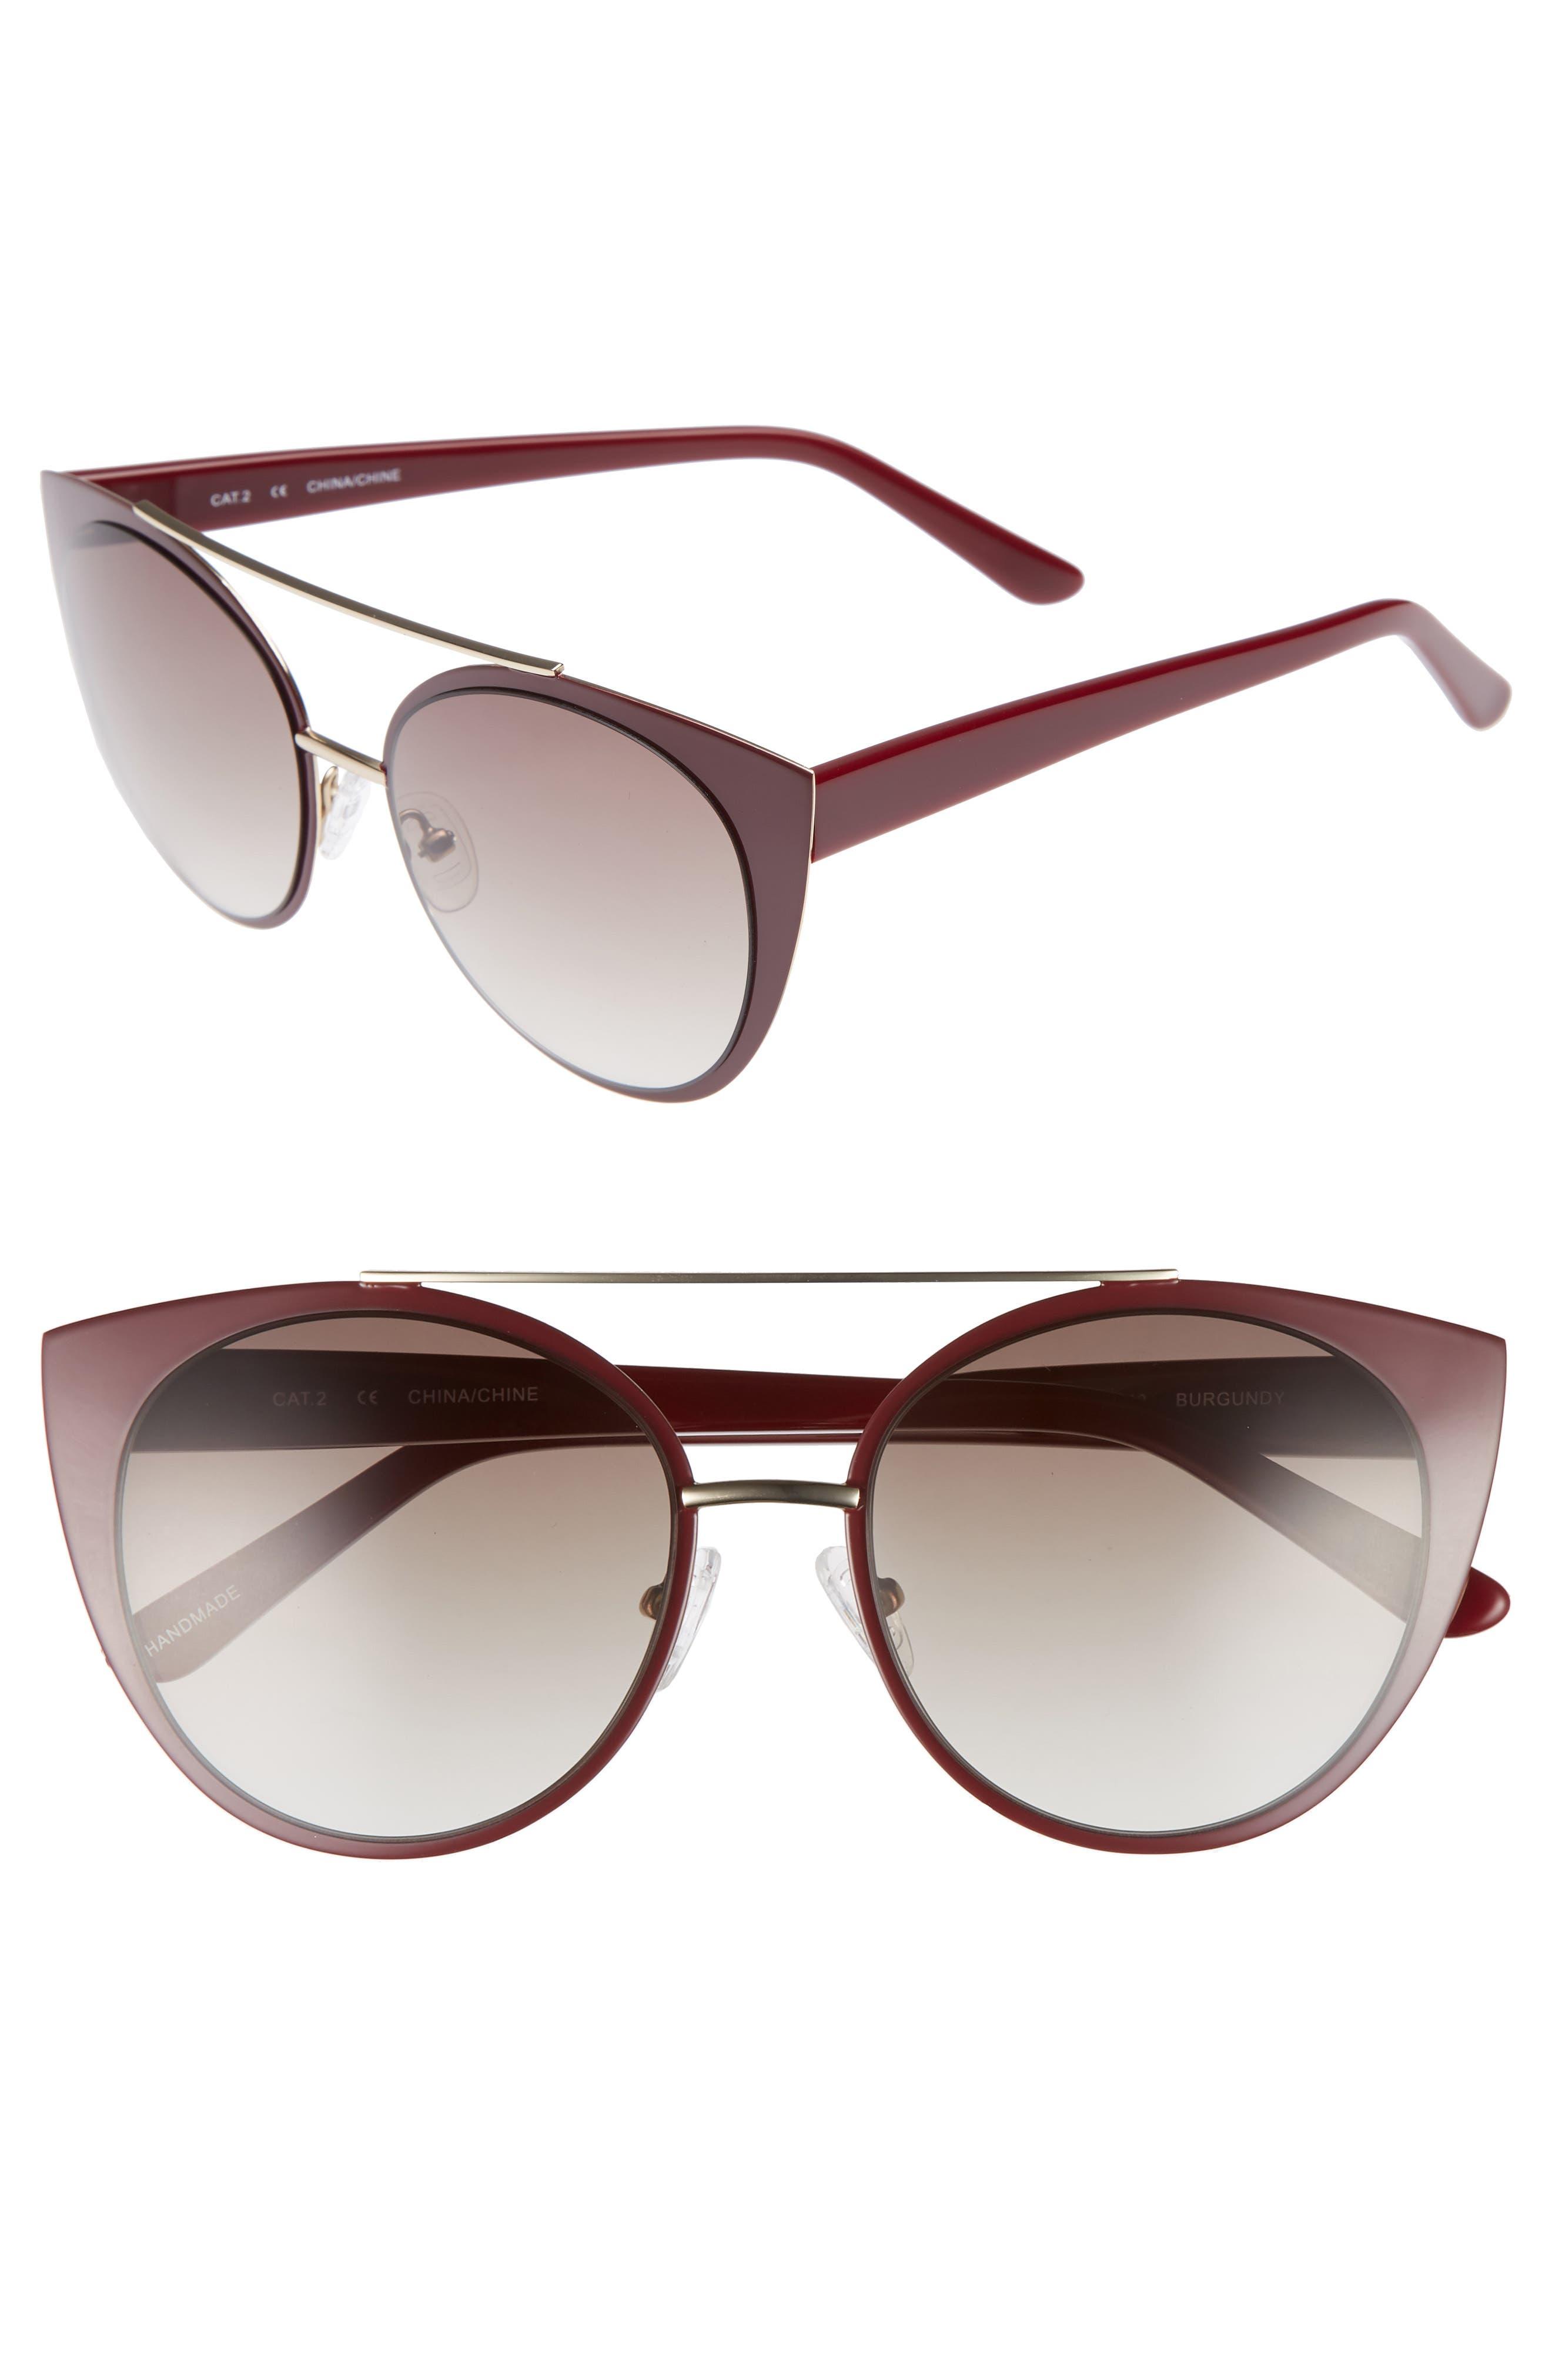 Amelia 53mm Aviator Sunglasses,                         Main,                         color, Burgundy